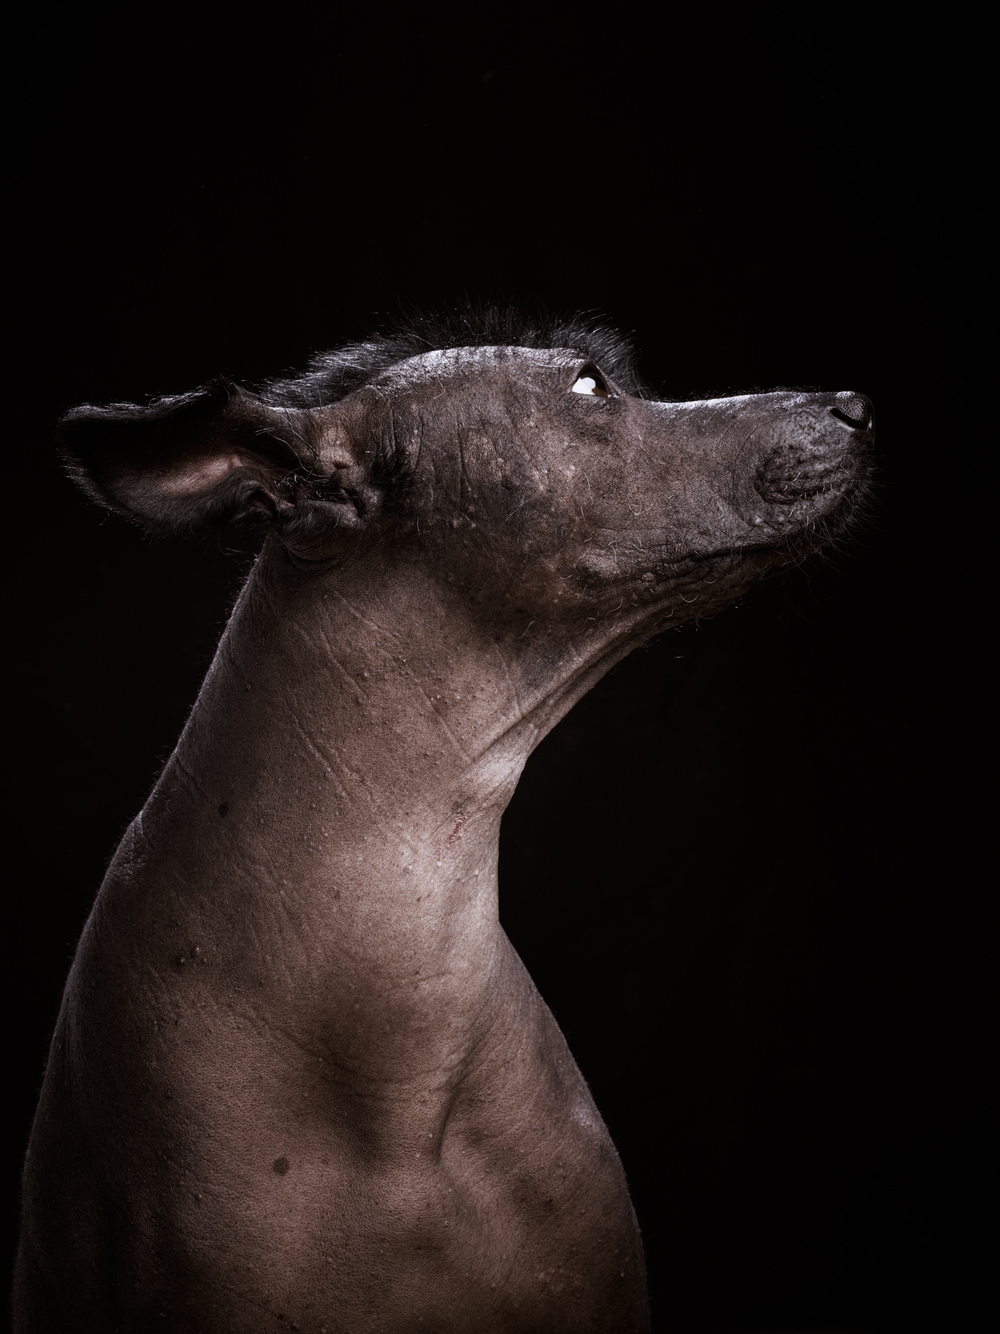 naked-dogs-klausdyba-26.jpg